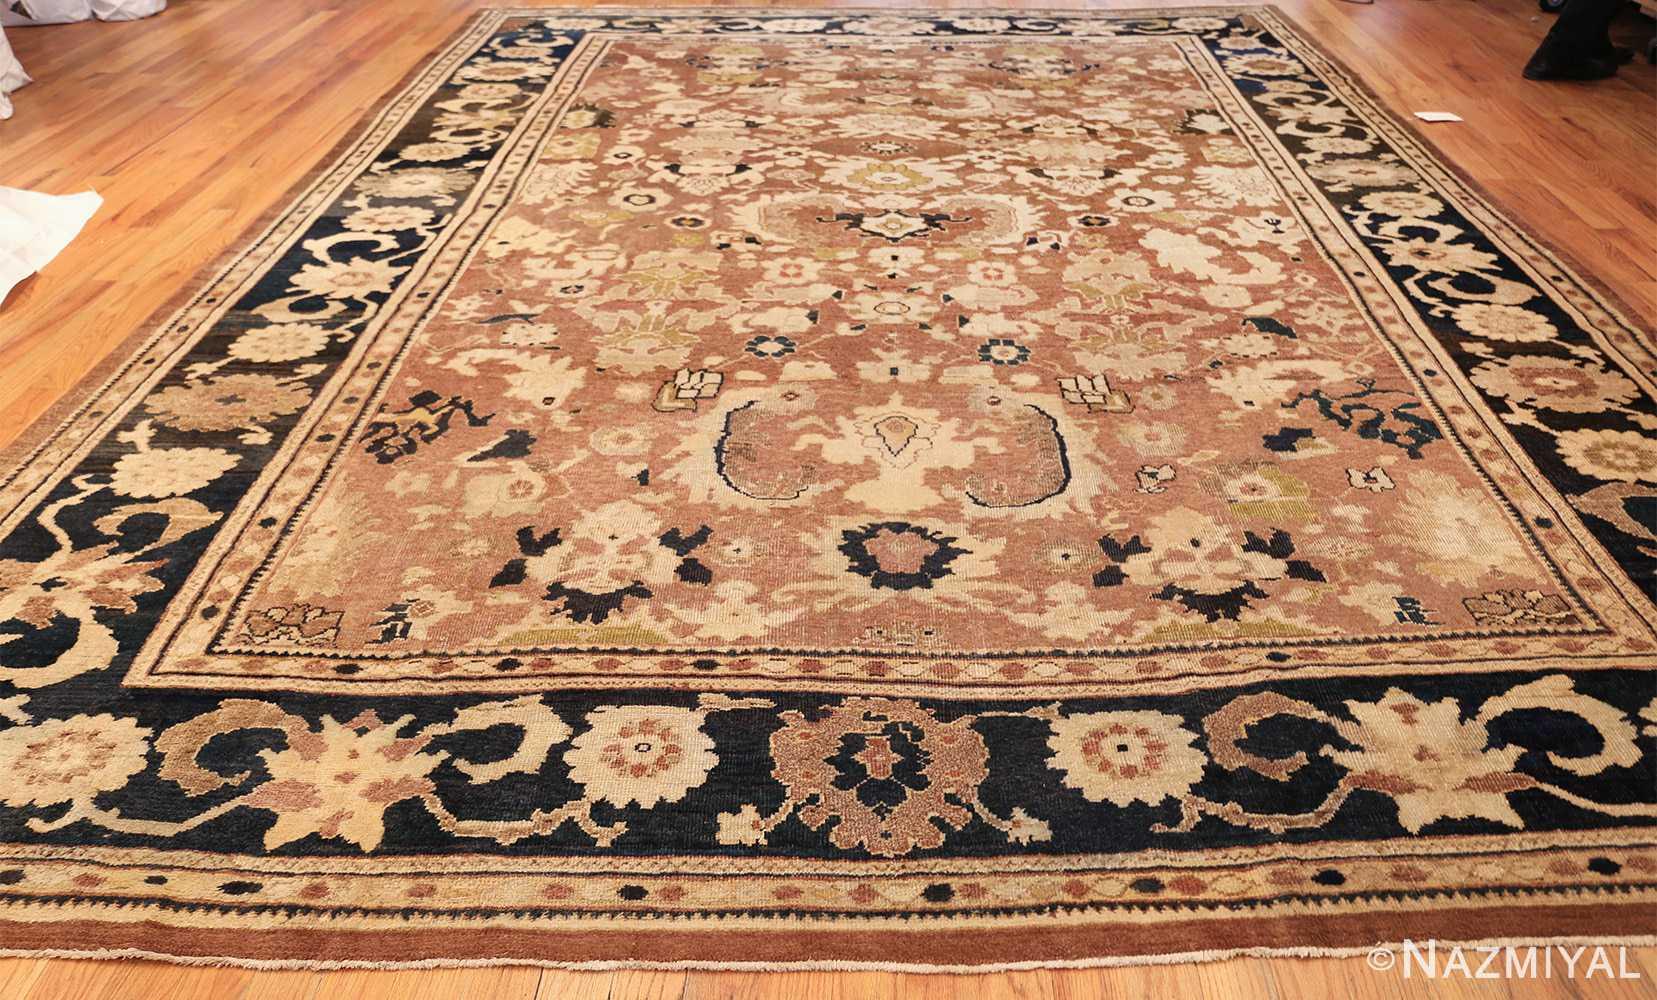 decorative antique persian sultanabad rug 48093 whole Nazmiyal